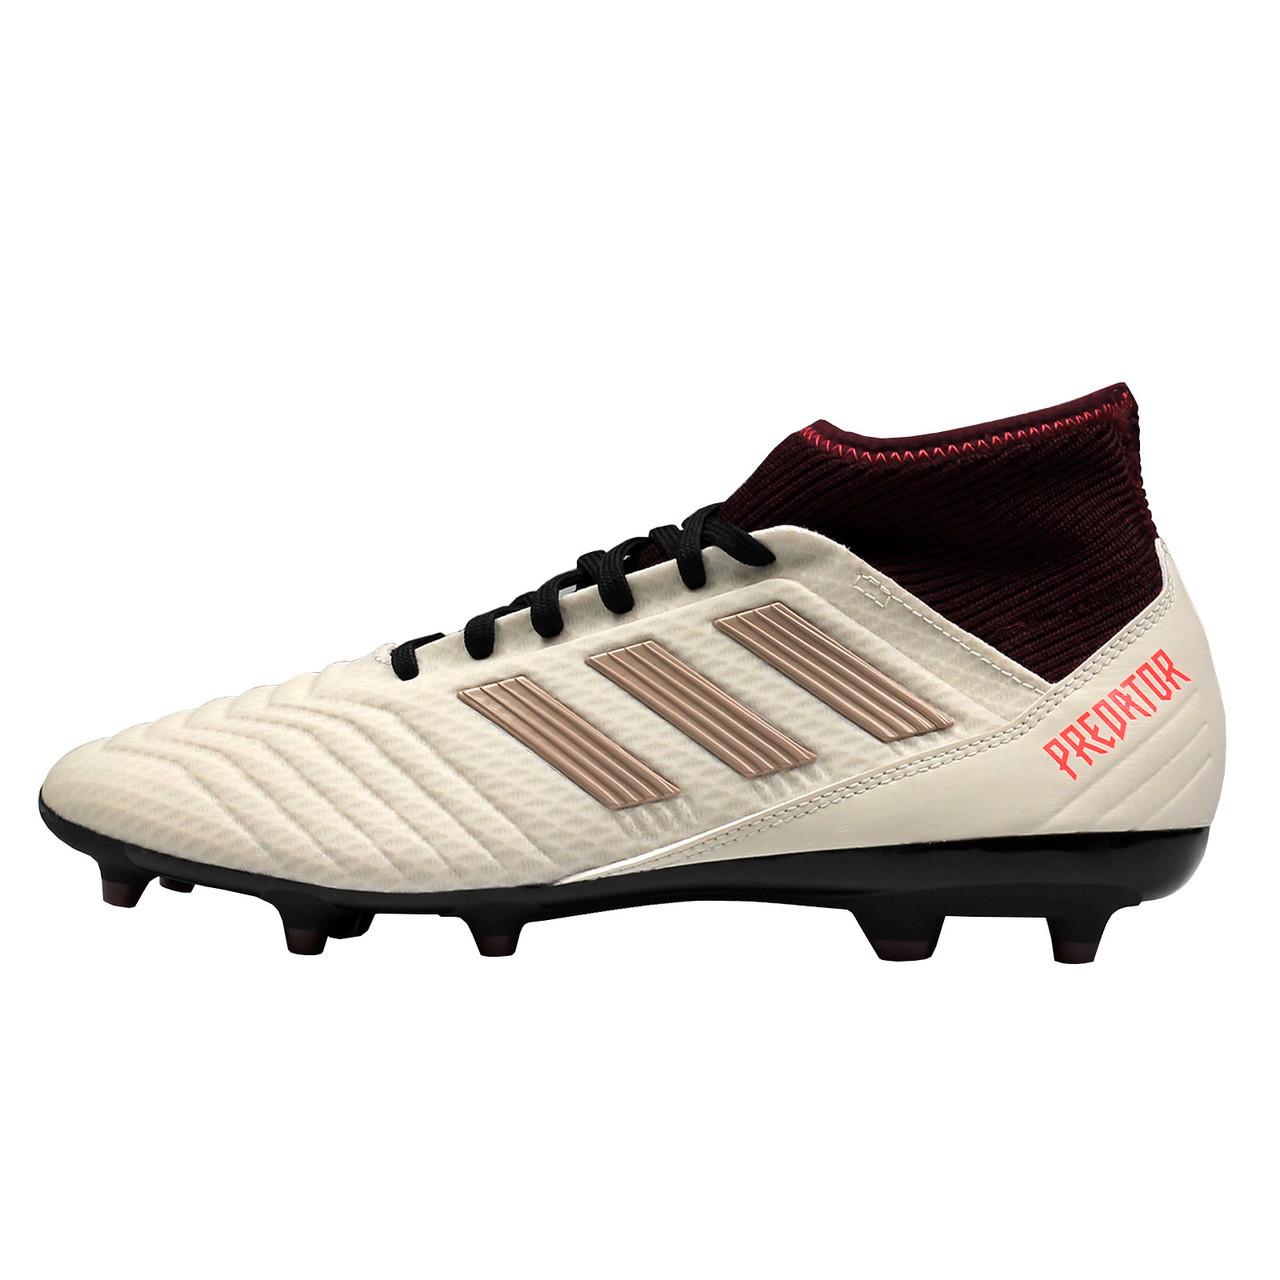 7fd71bcd4 Adidas Predator 18.3 FG Women s Soccer Cleats DB2511 ...